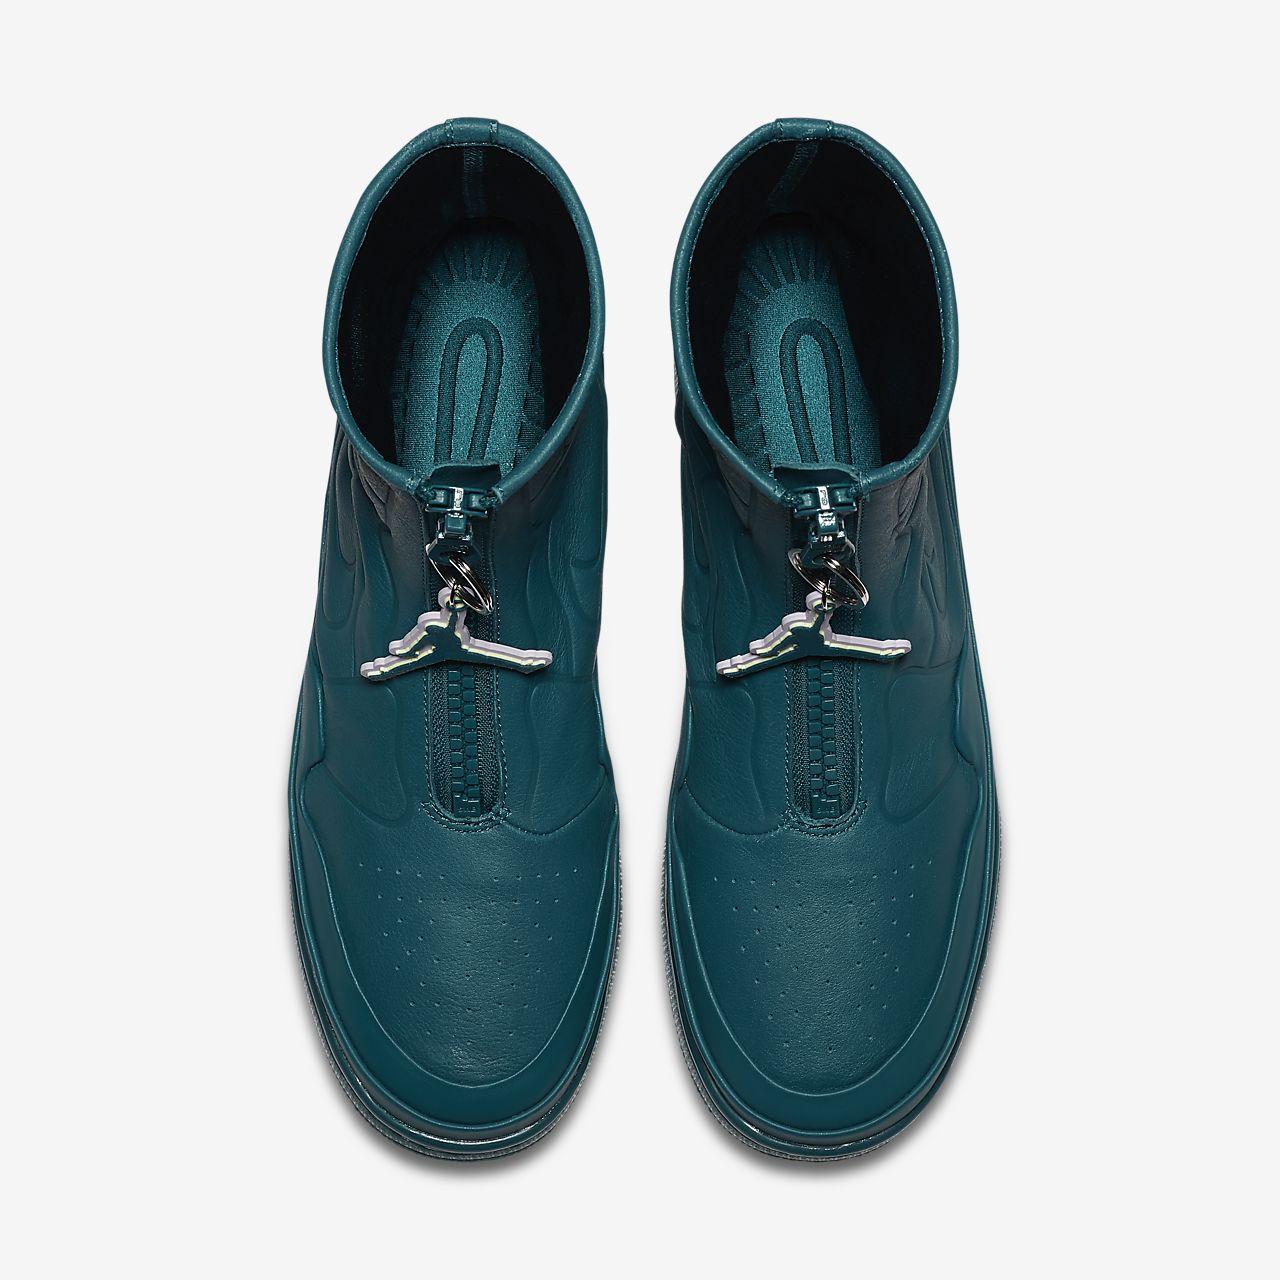 new product bd547 6b715 Jordan AJ1 Jester XX damesko. Nike.com NO